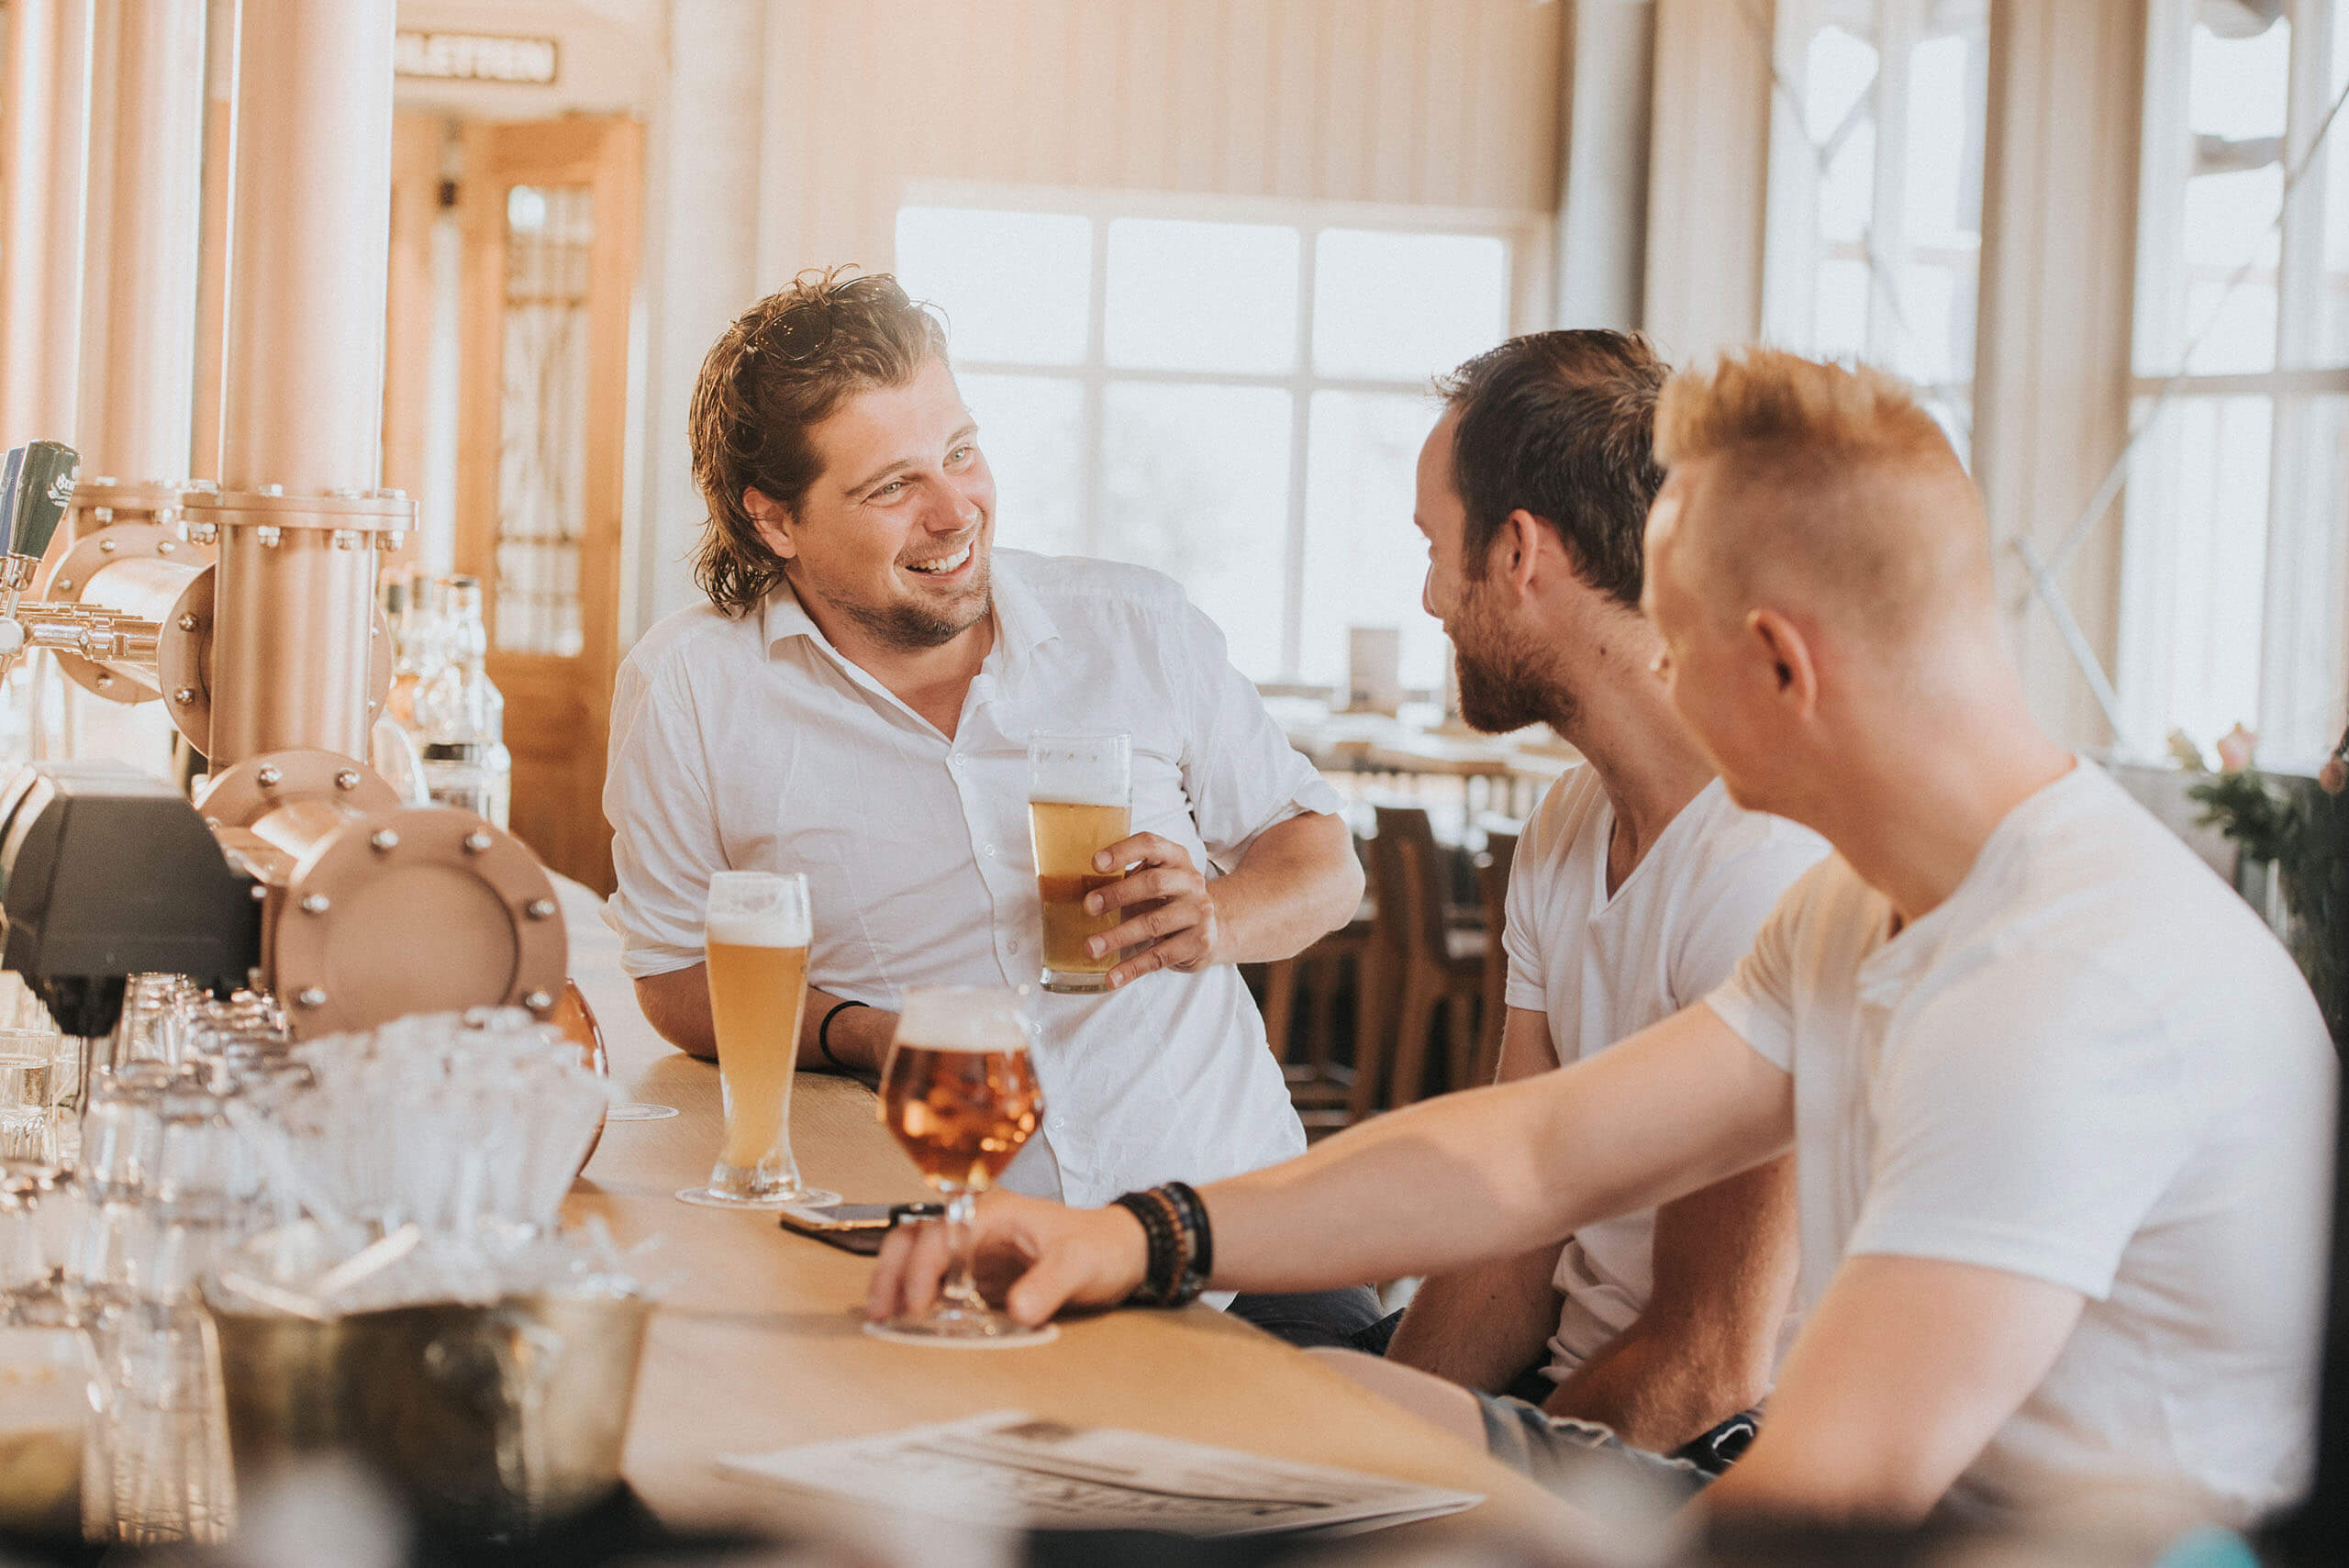 fotoreportage horeca badhuys westcord Vlieland sfeerfotografie bier vrienden